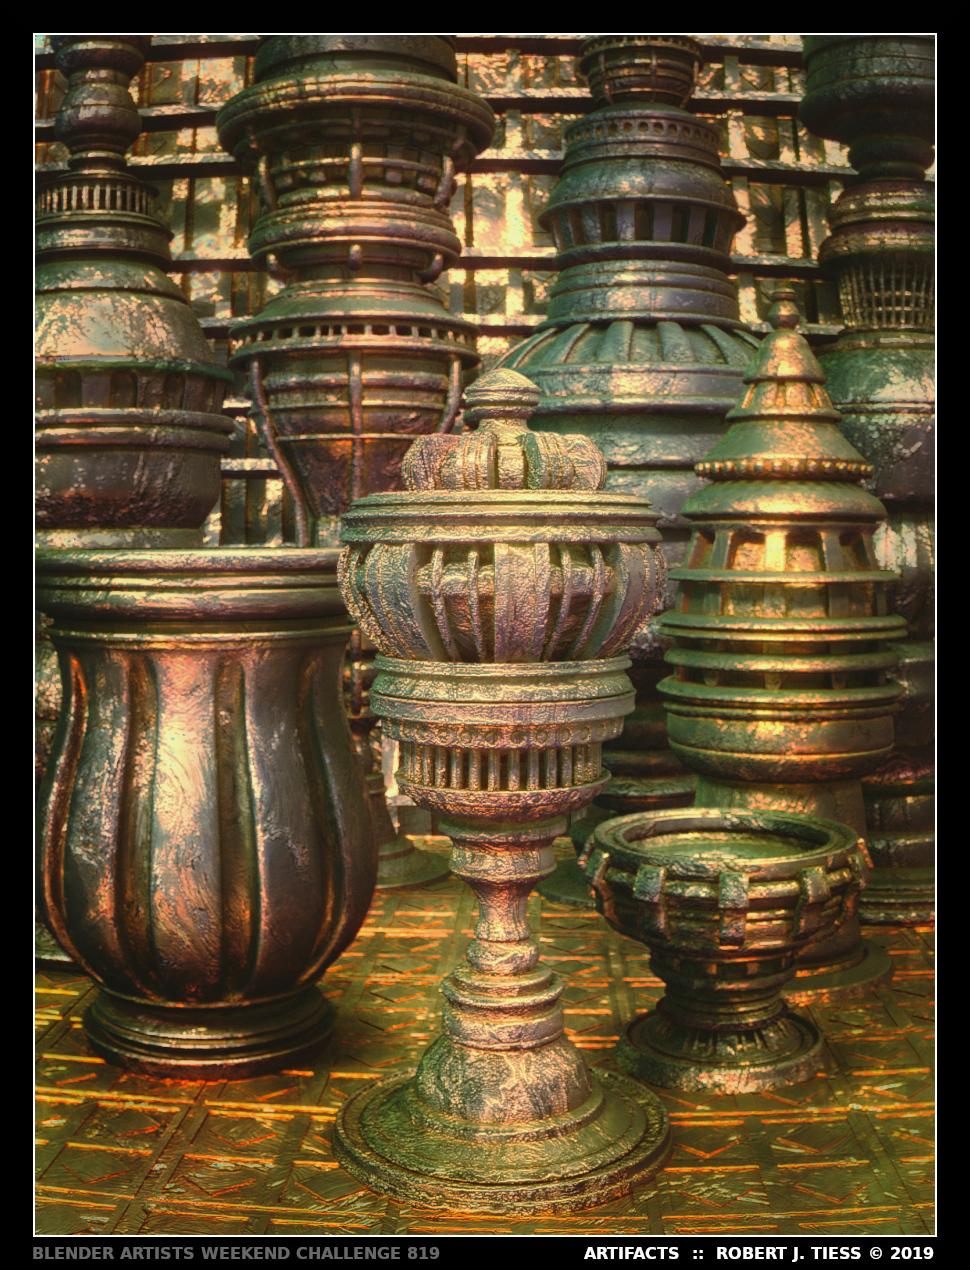 Artifacts - By Robert J. Tiess